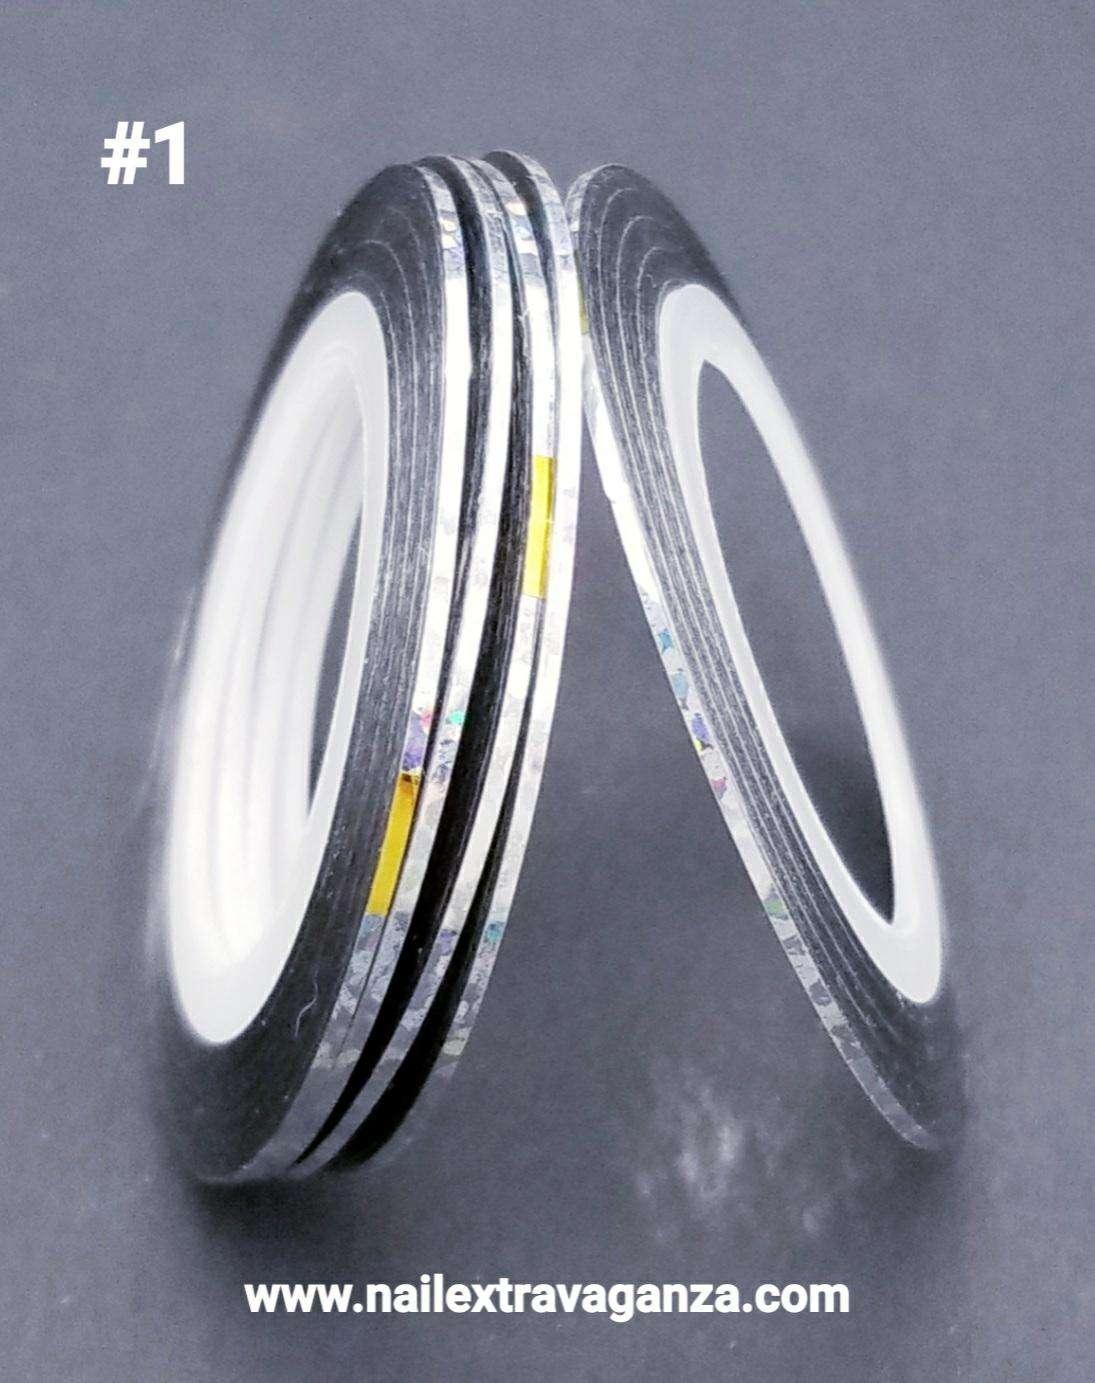 Nail Art Strips Lines (Cintilla) Laser Silver 1mm #1